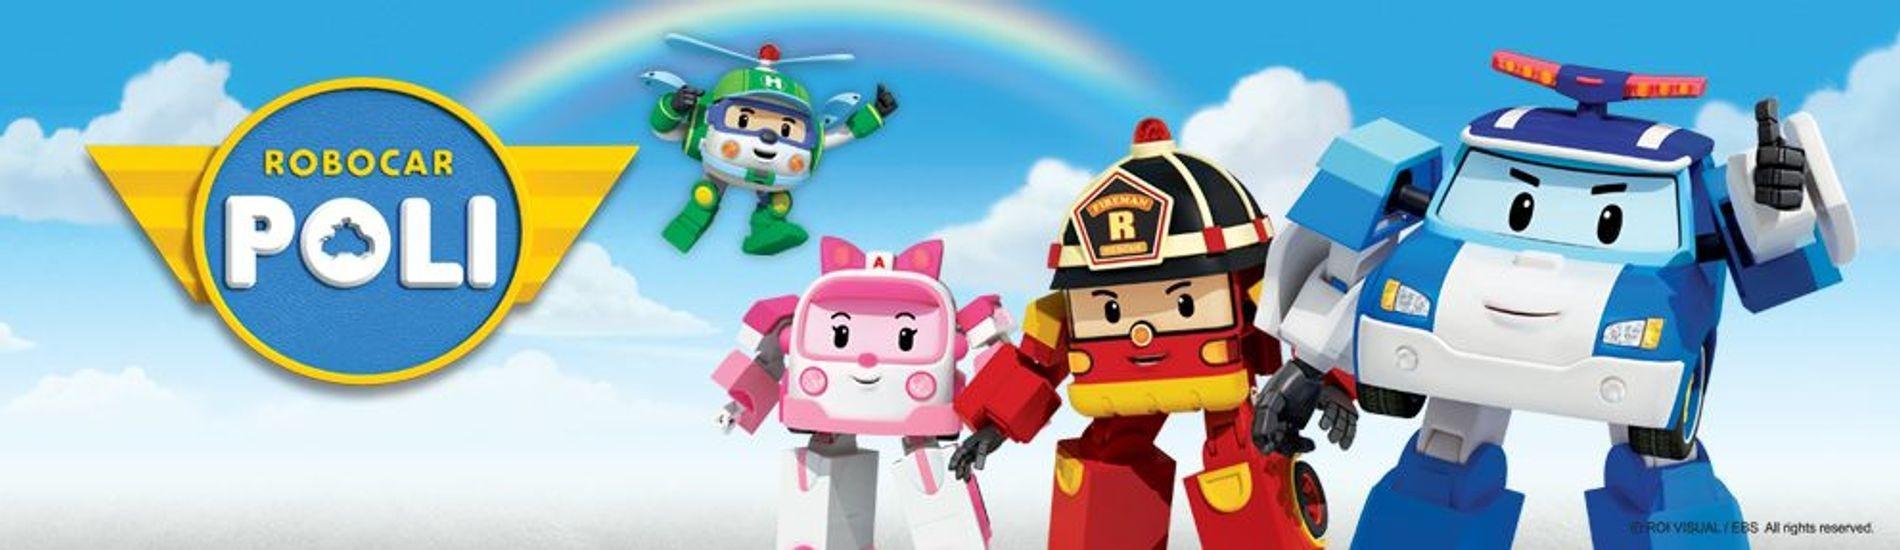 Coloriage robocar poli ambre 1 coloriage robocar poli coloriages dessins animes - Dessin anime de robocar poli ...